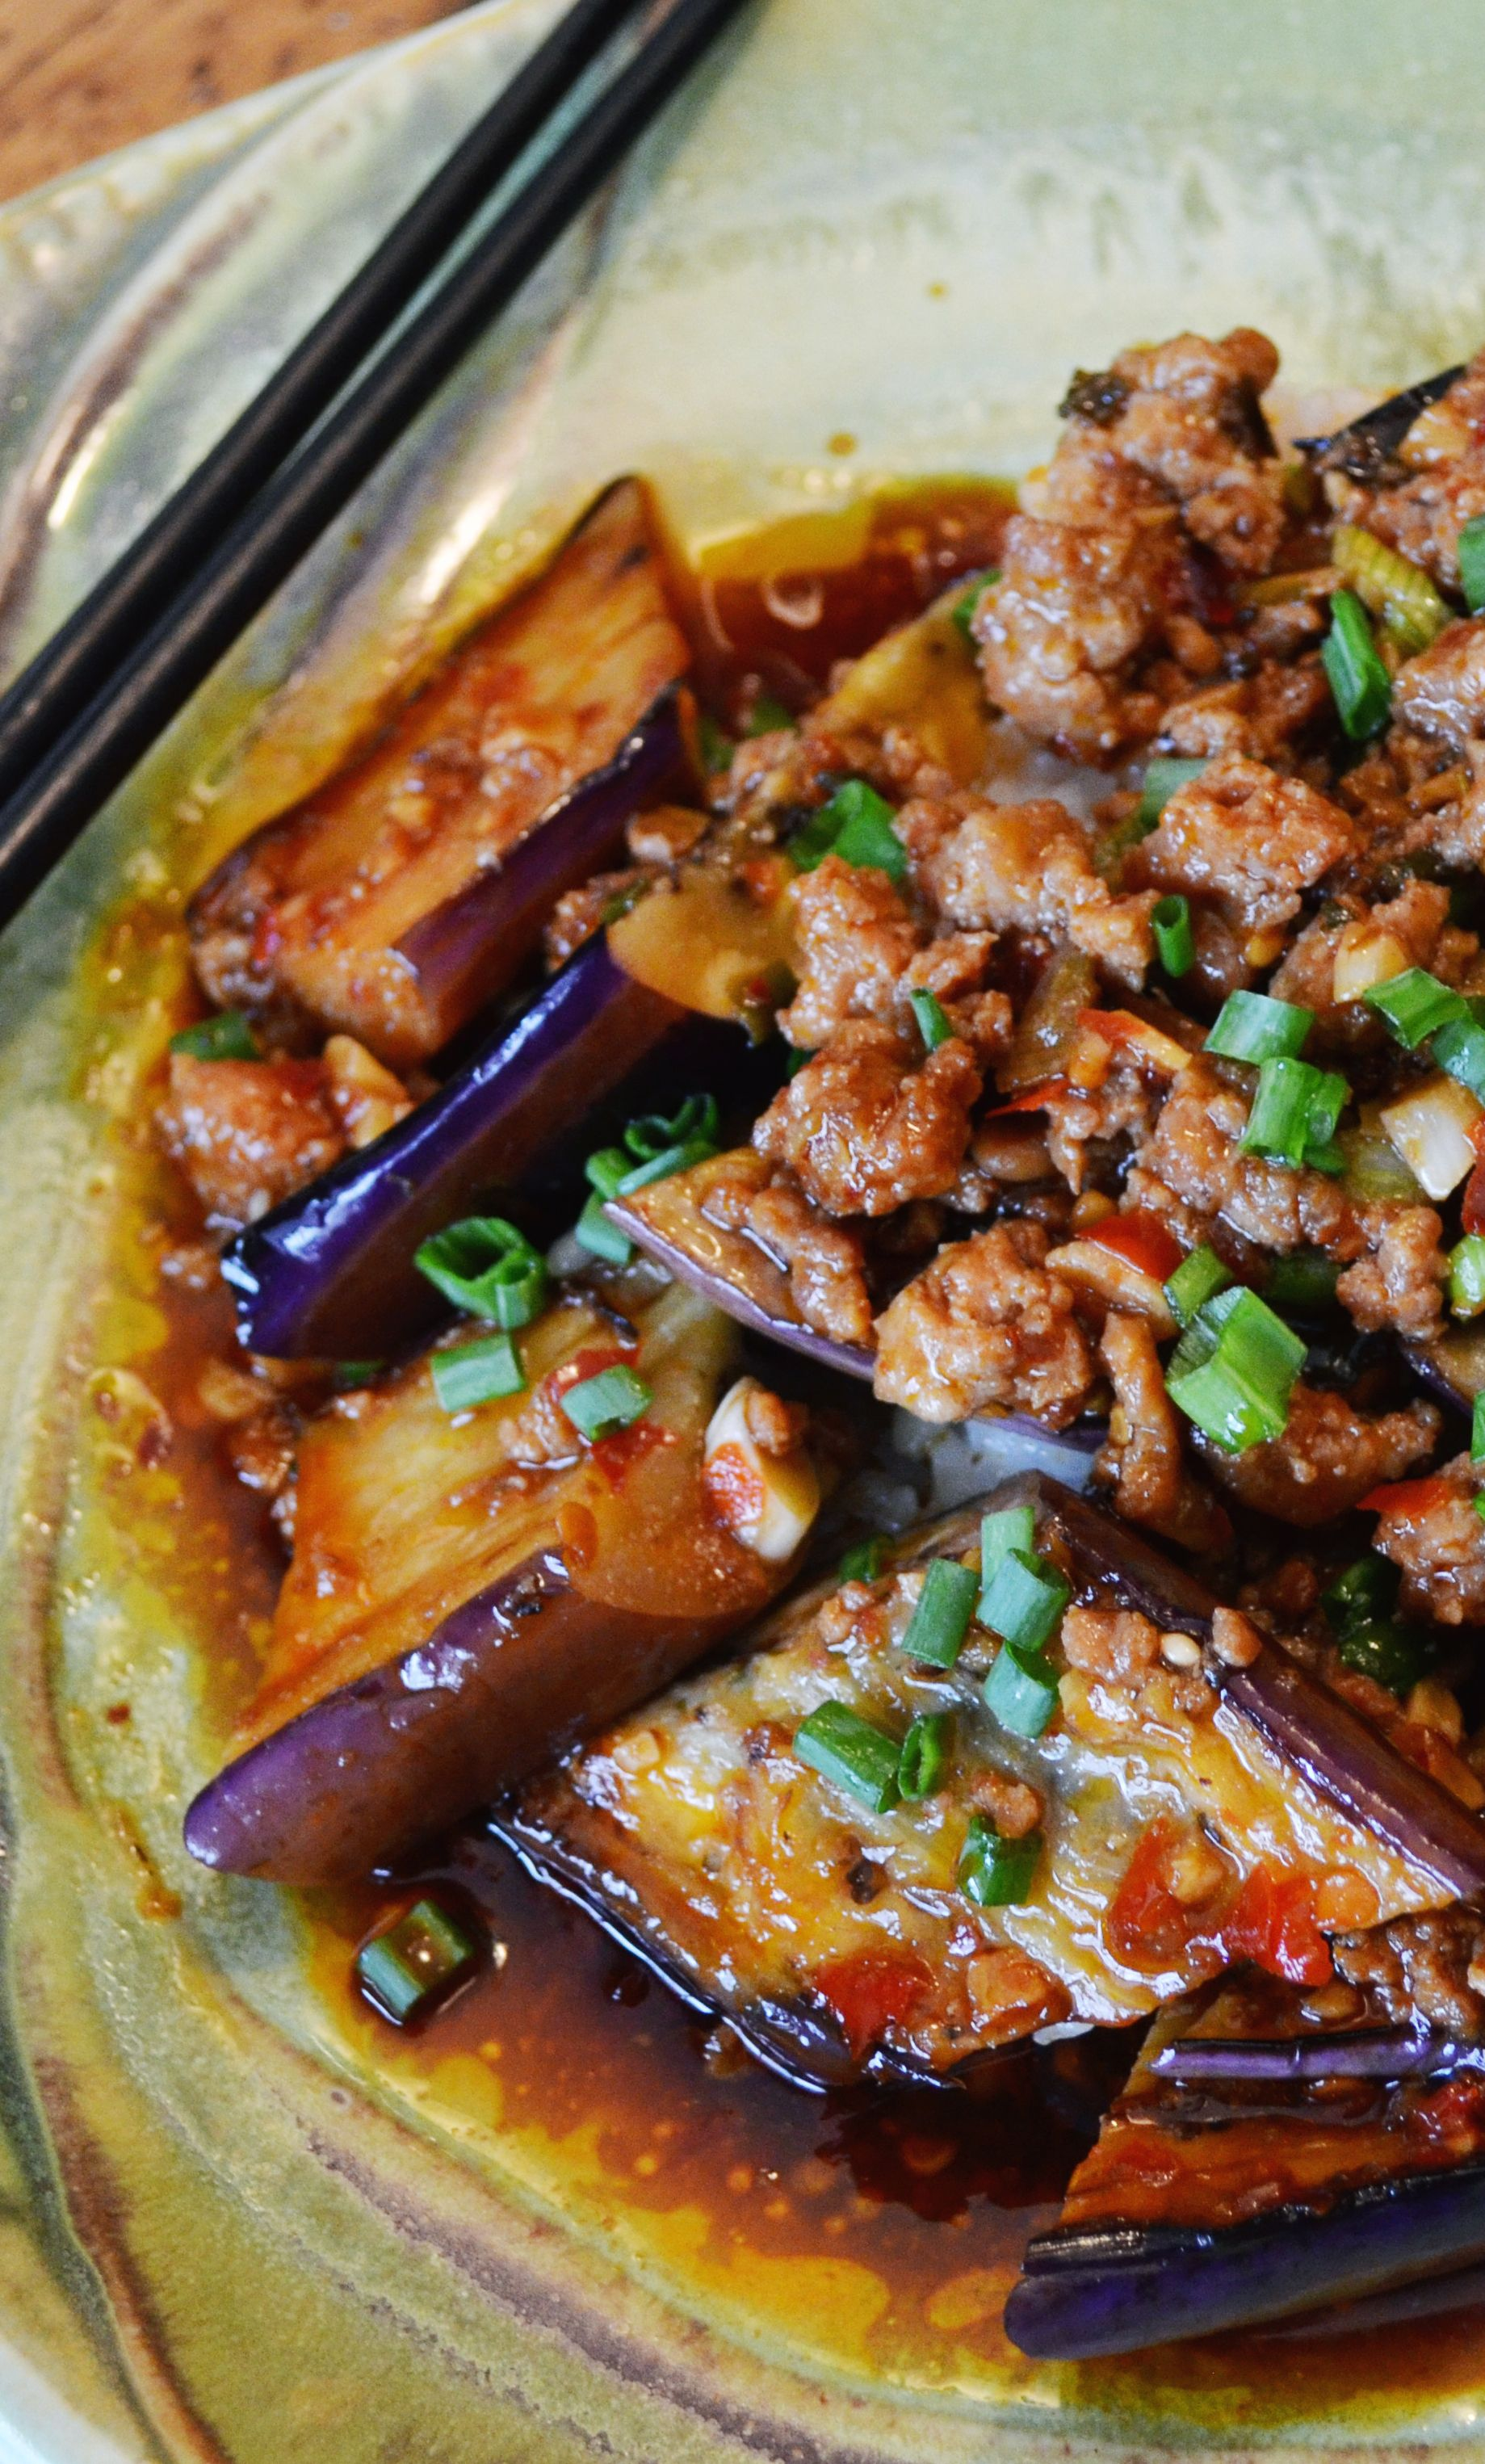 Ma po eggplant in garlic sauce recipe garlic sauce eggplants ma po eggplant in garlic sauce chinese food recipesasian forumfinder Choice Image